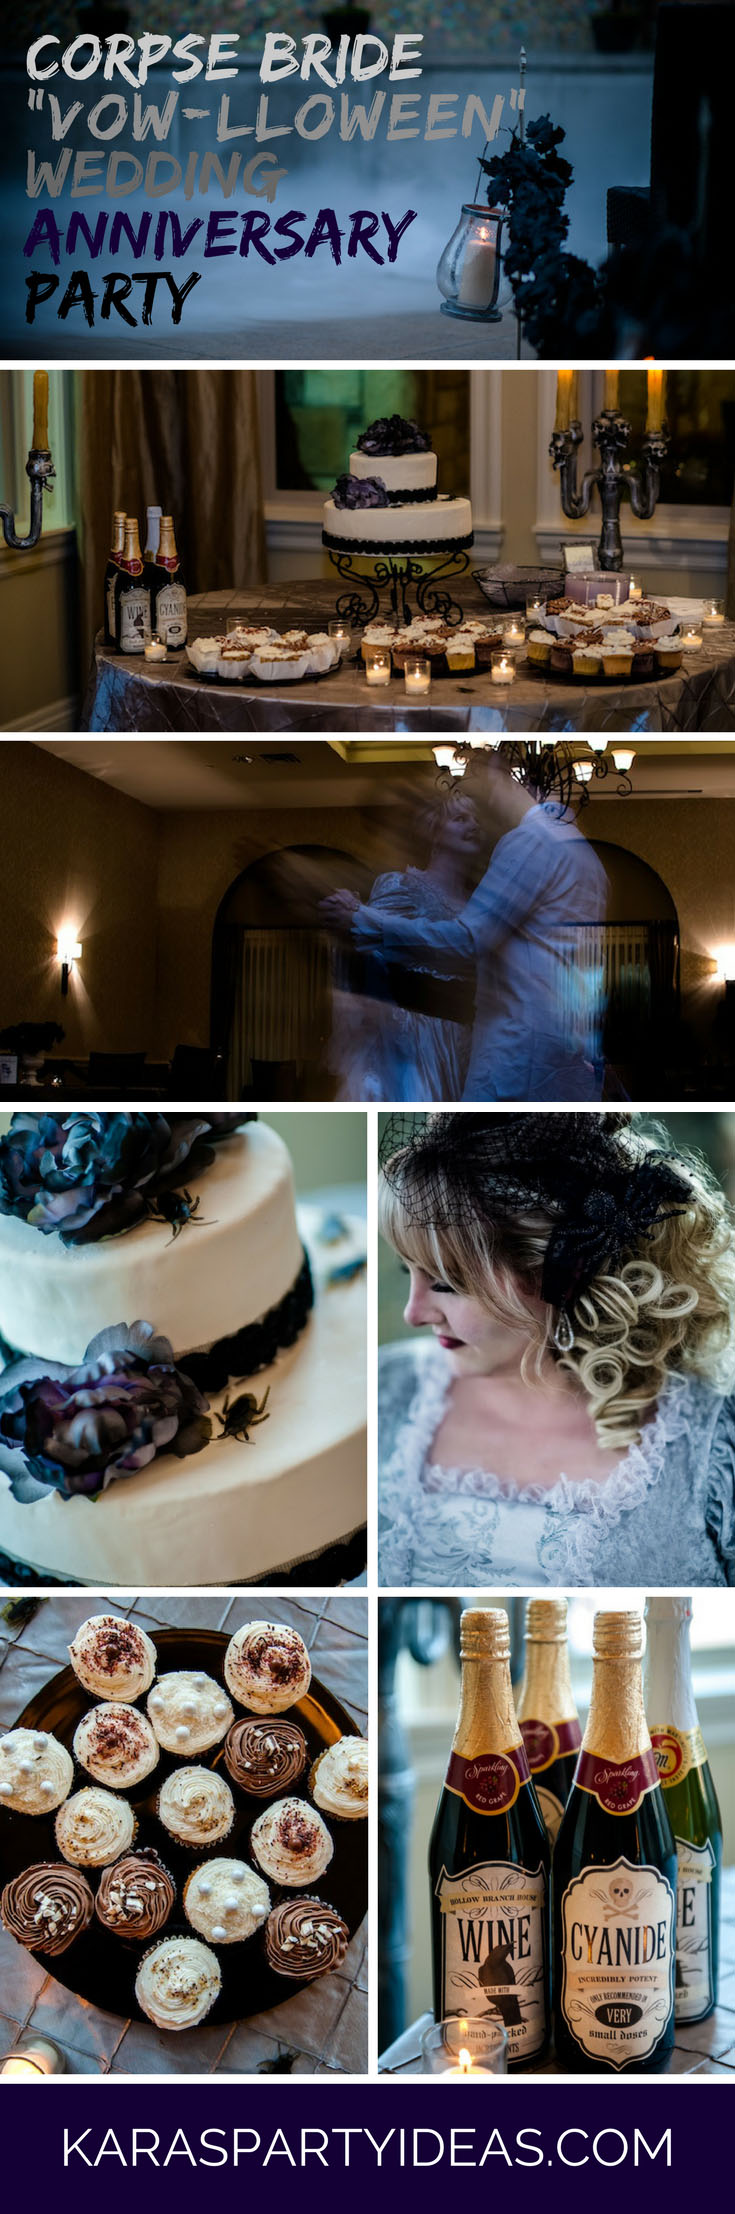 Corpse Bride Vow-lloween Wedding Anniversary Party via Kara's Party Ideas - KarasPartyIdeas.com